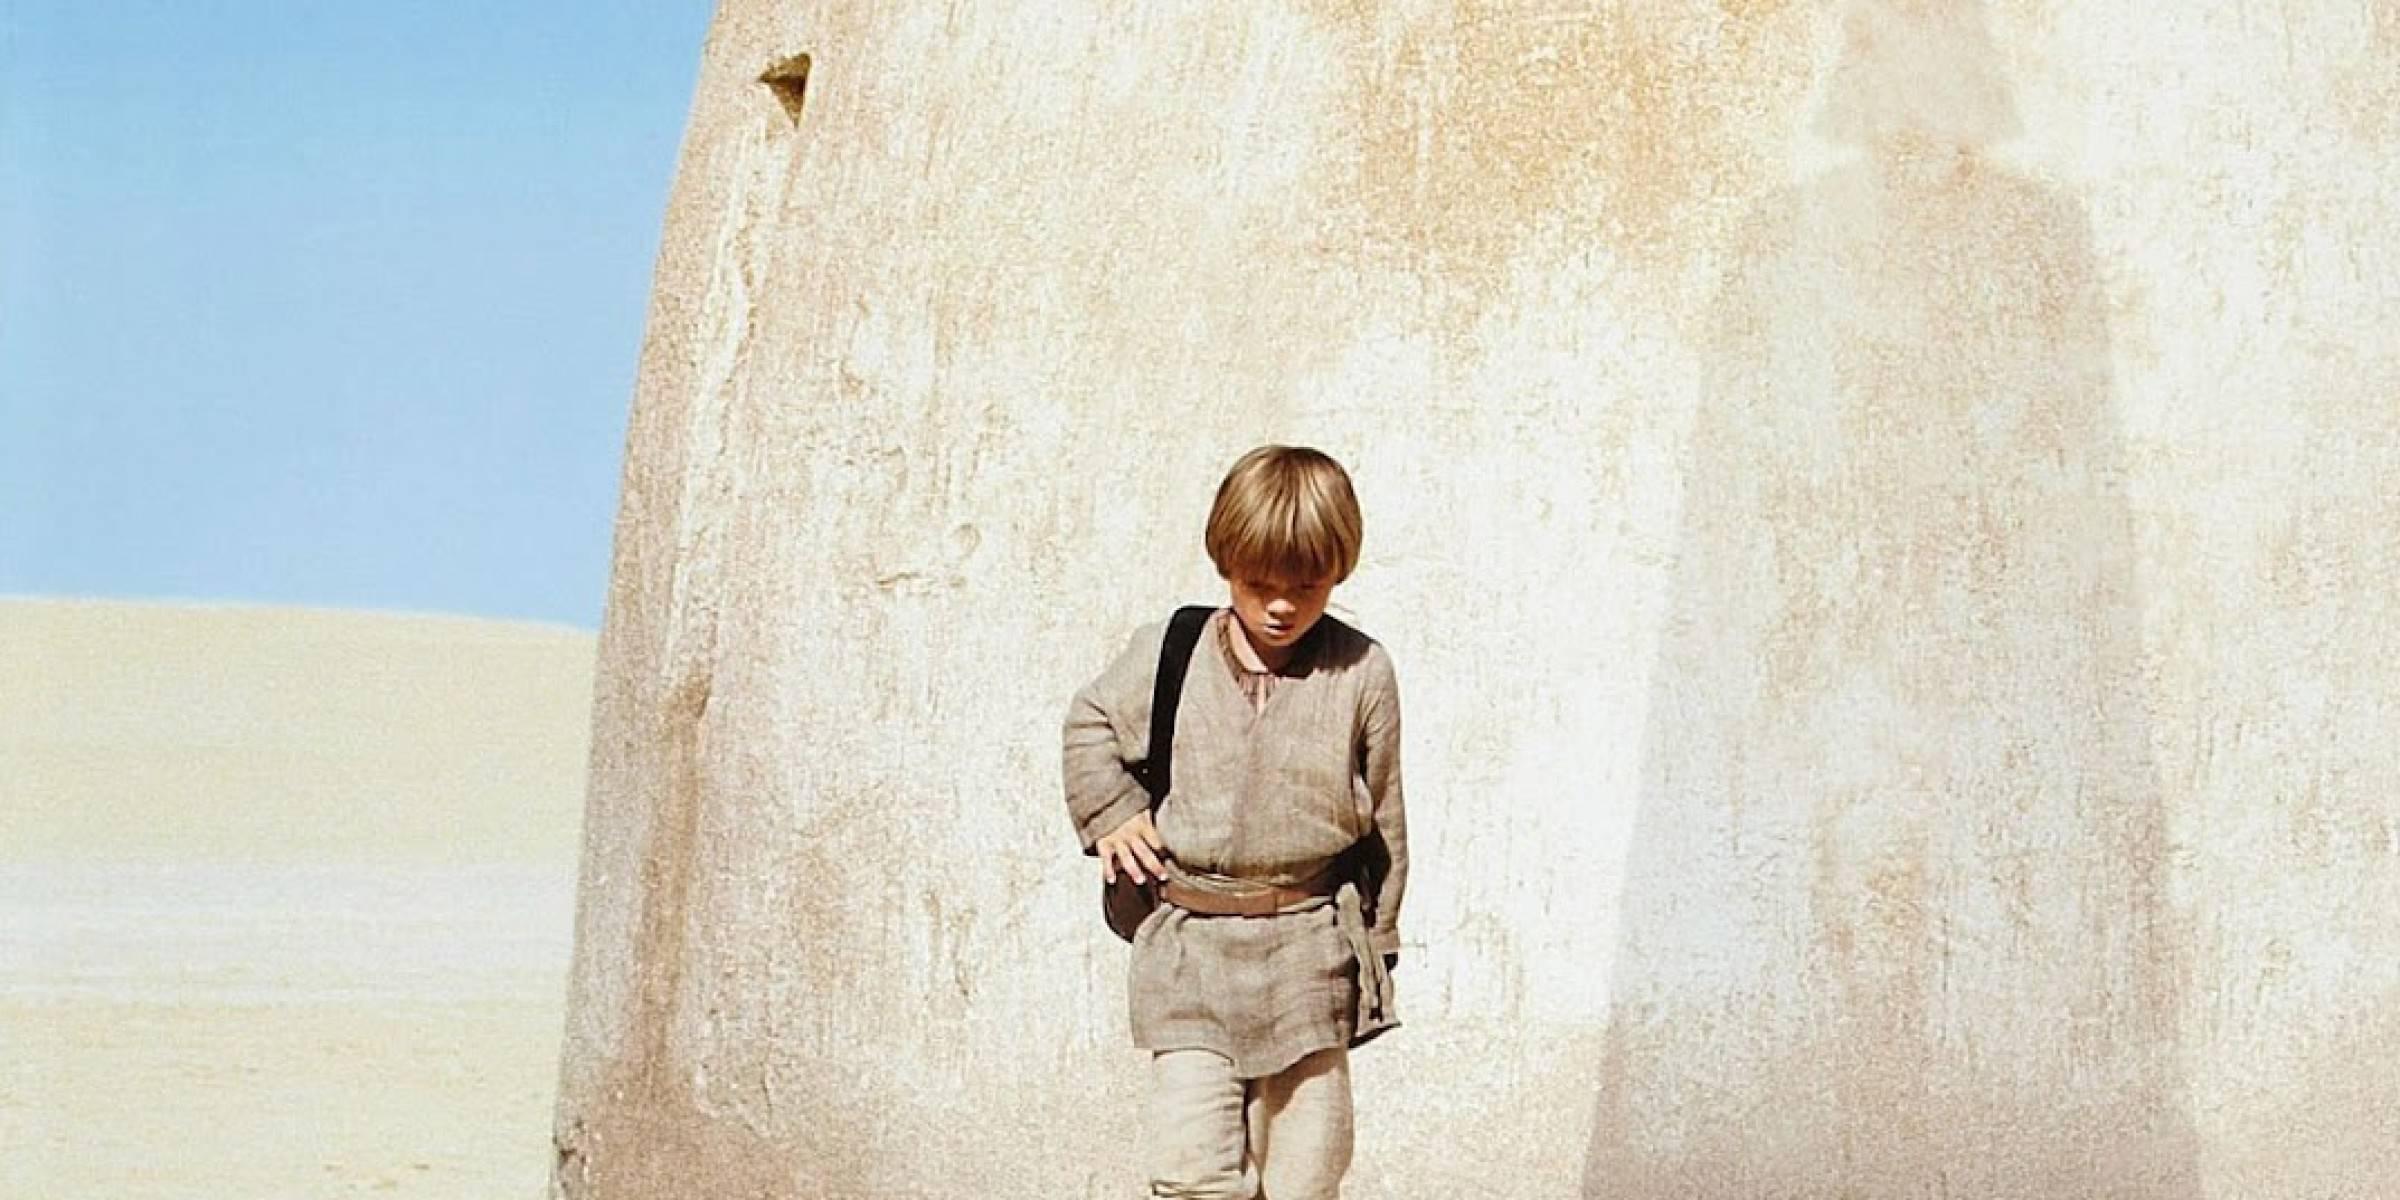 Star-Wars-Episode-1-The-Phantom-Menace-1999-Teaser-2400x1200-526689992658